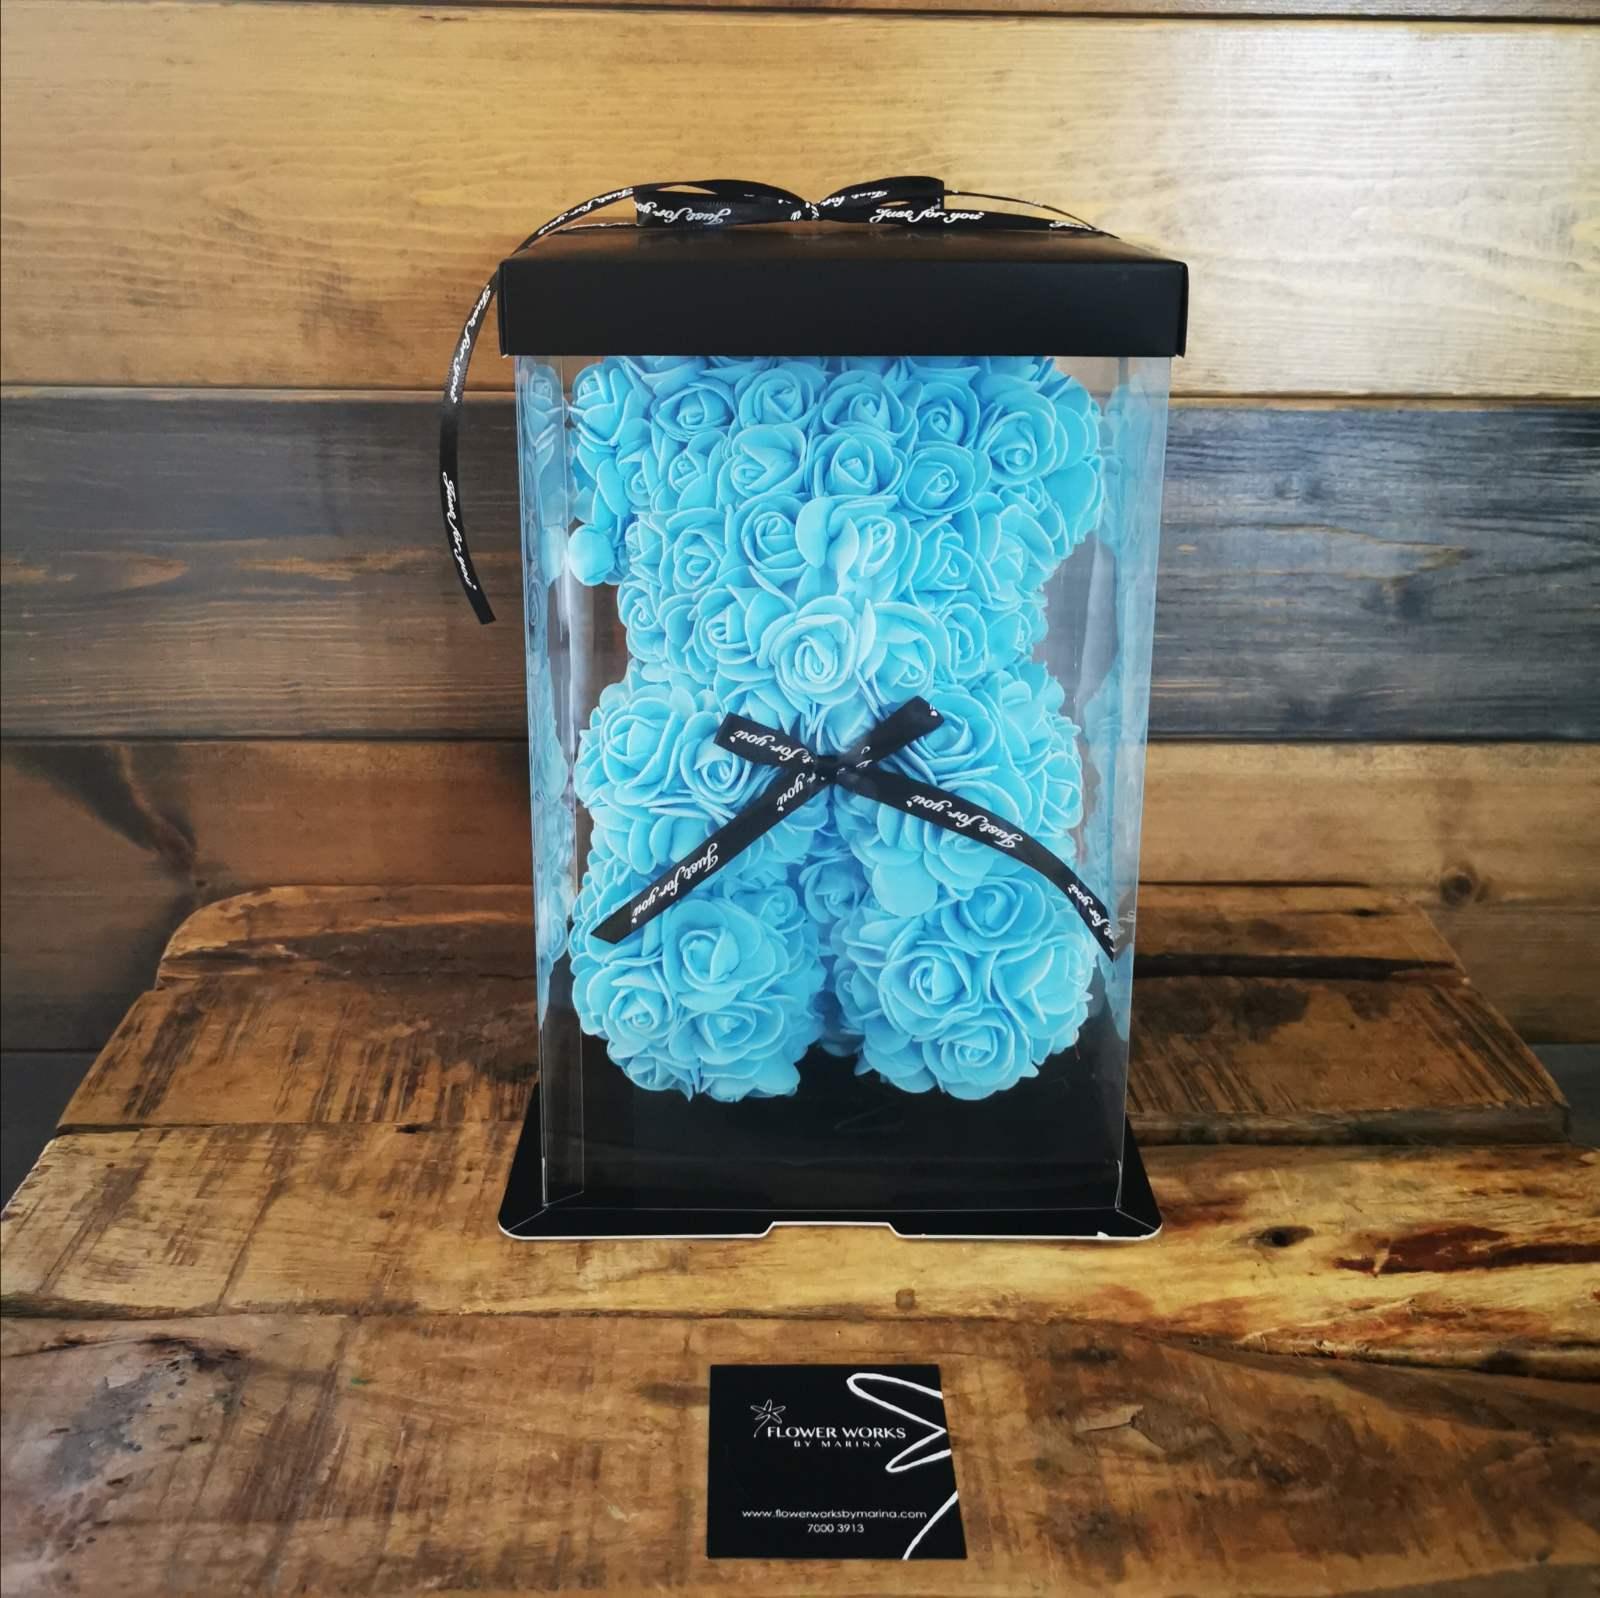 ARTIFICIAL TEDDY BEAR LIGHT BLUE SMALL SIZE